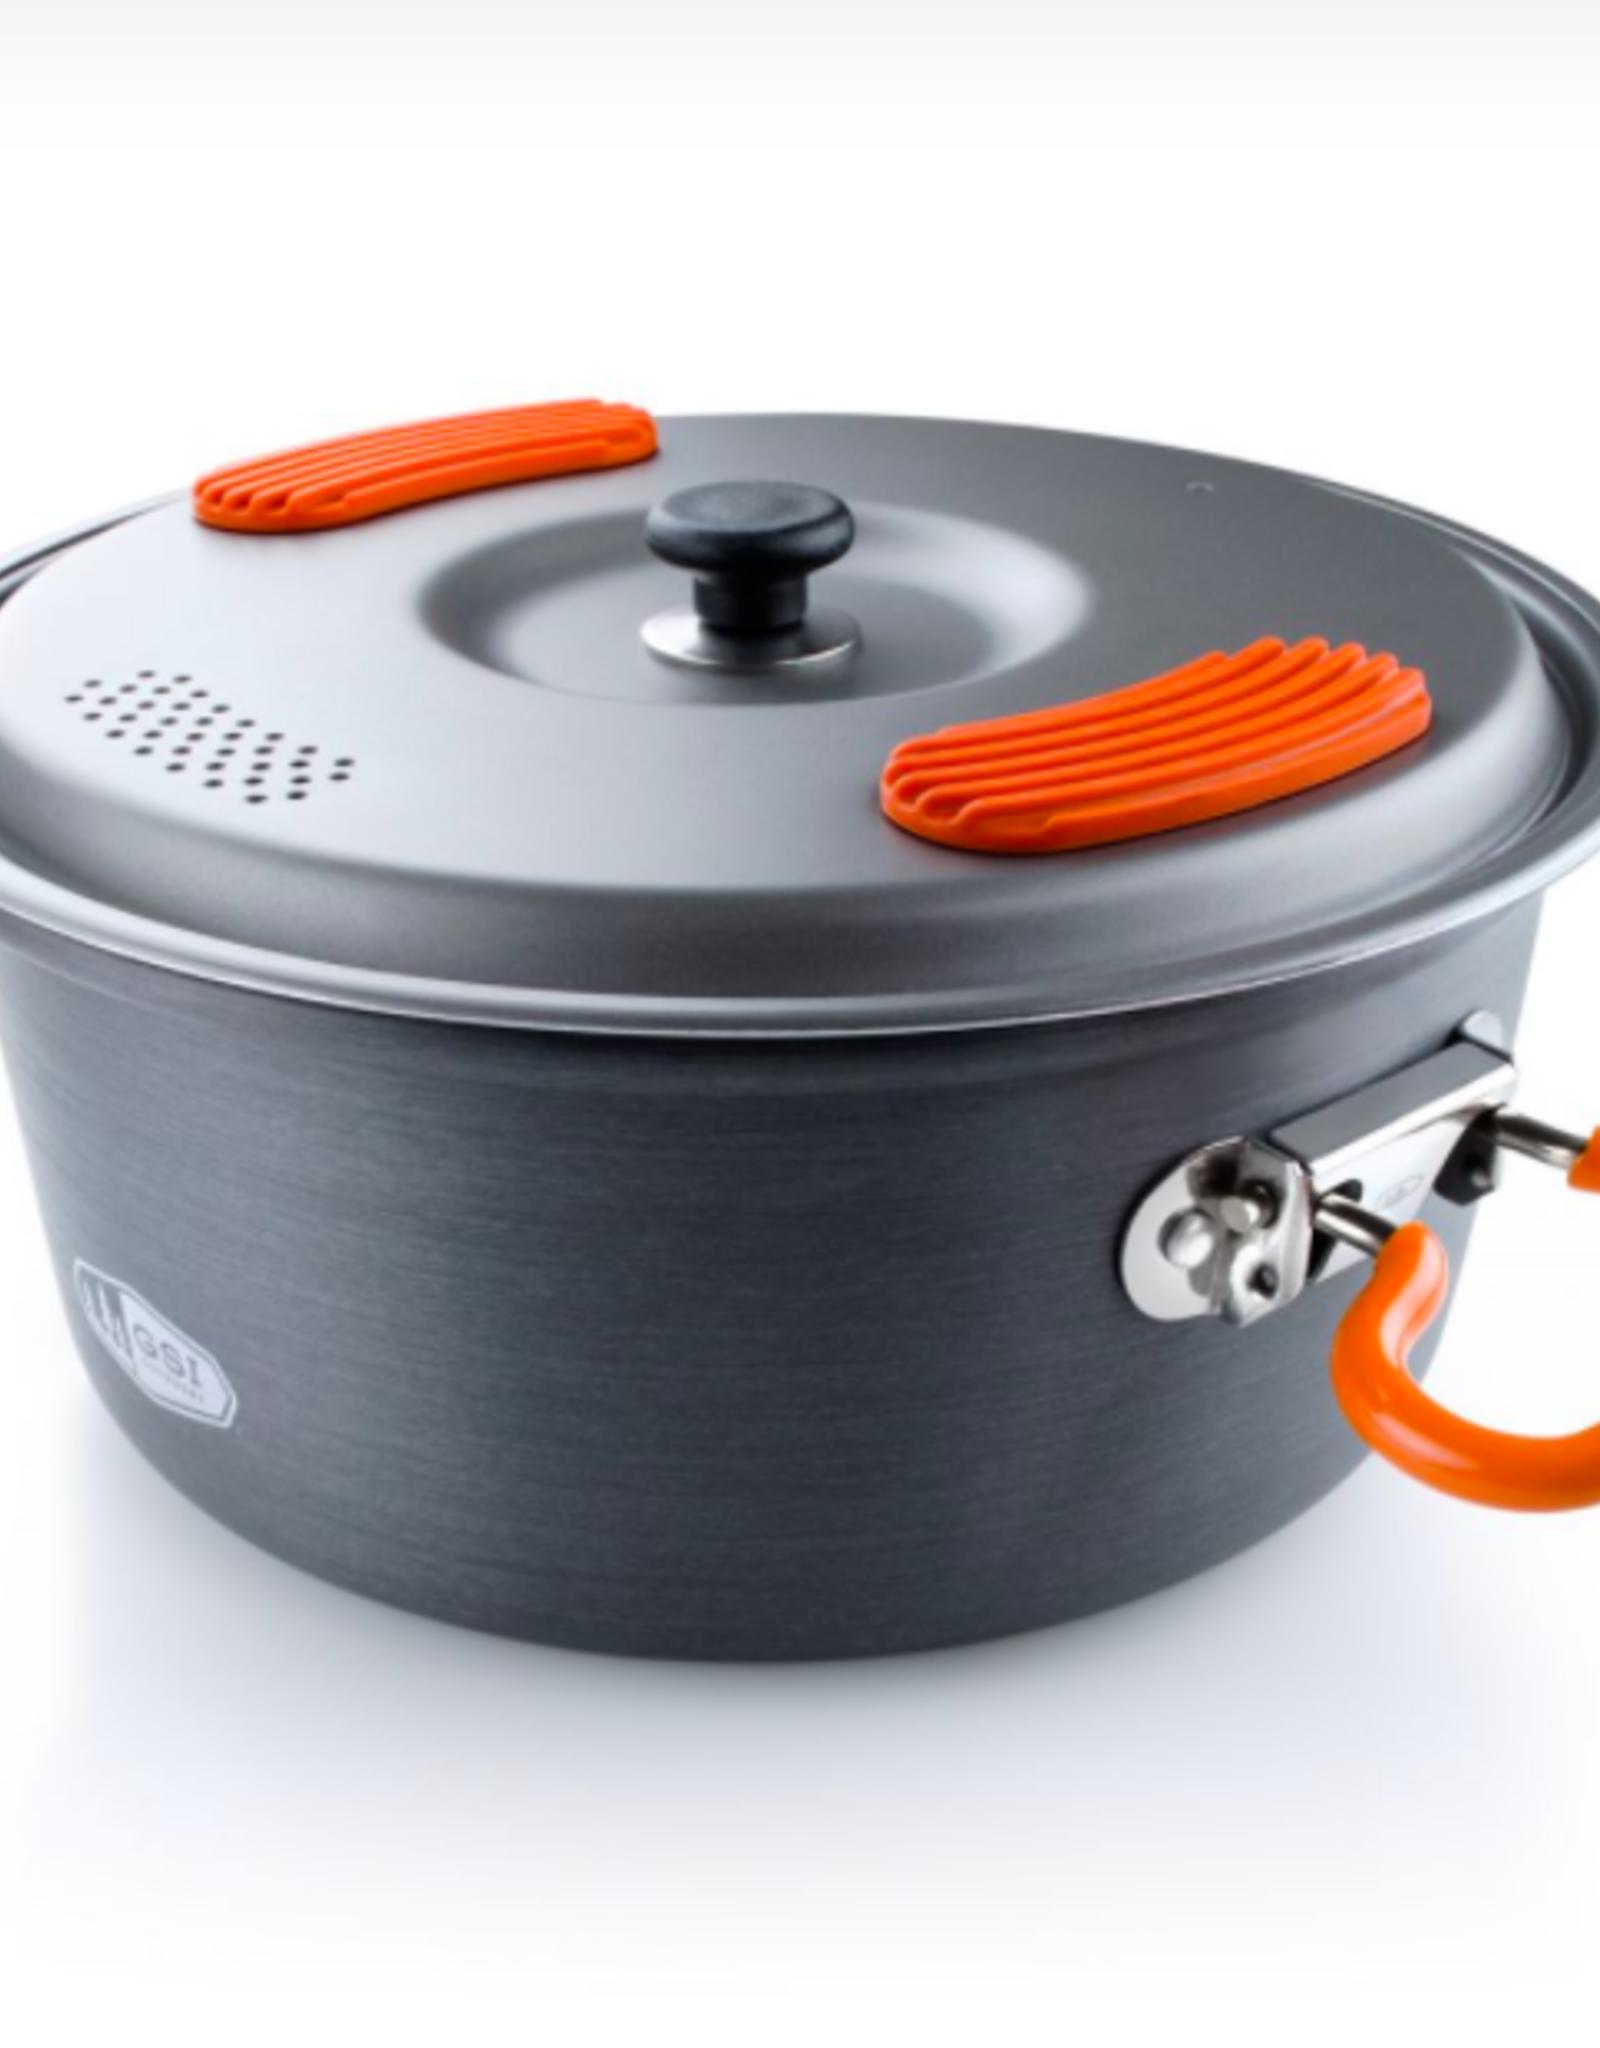 GSI Halulite 2.2 L Cook Pot